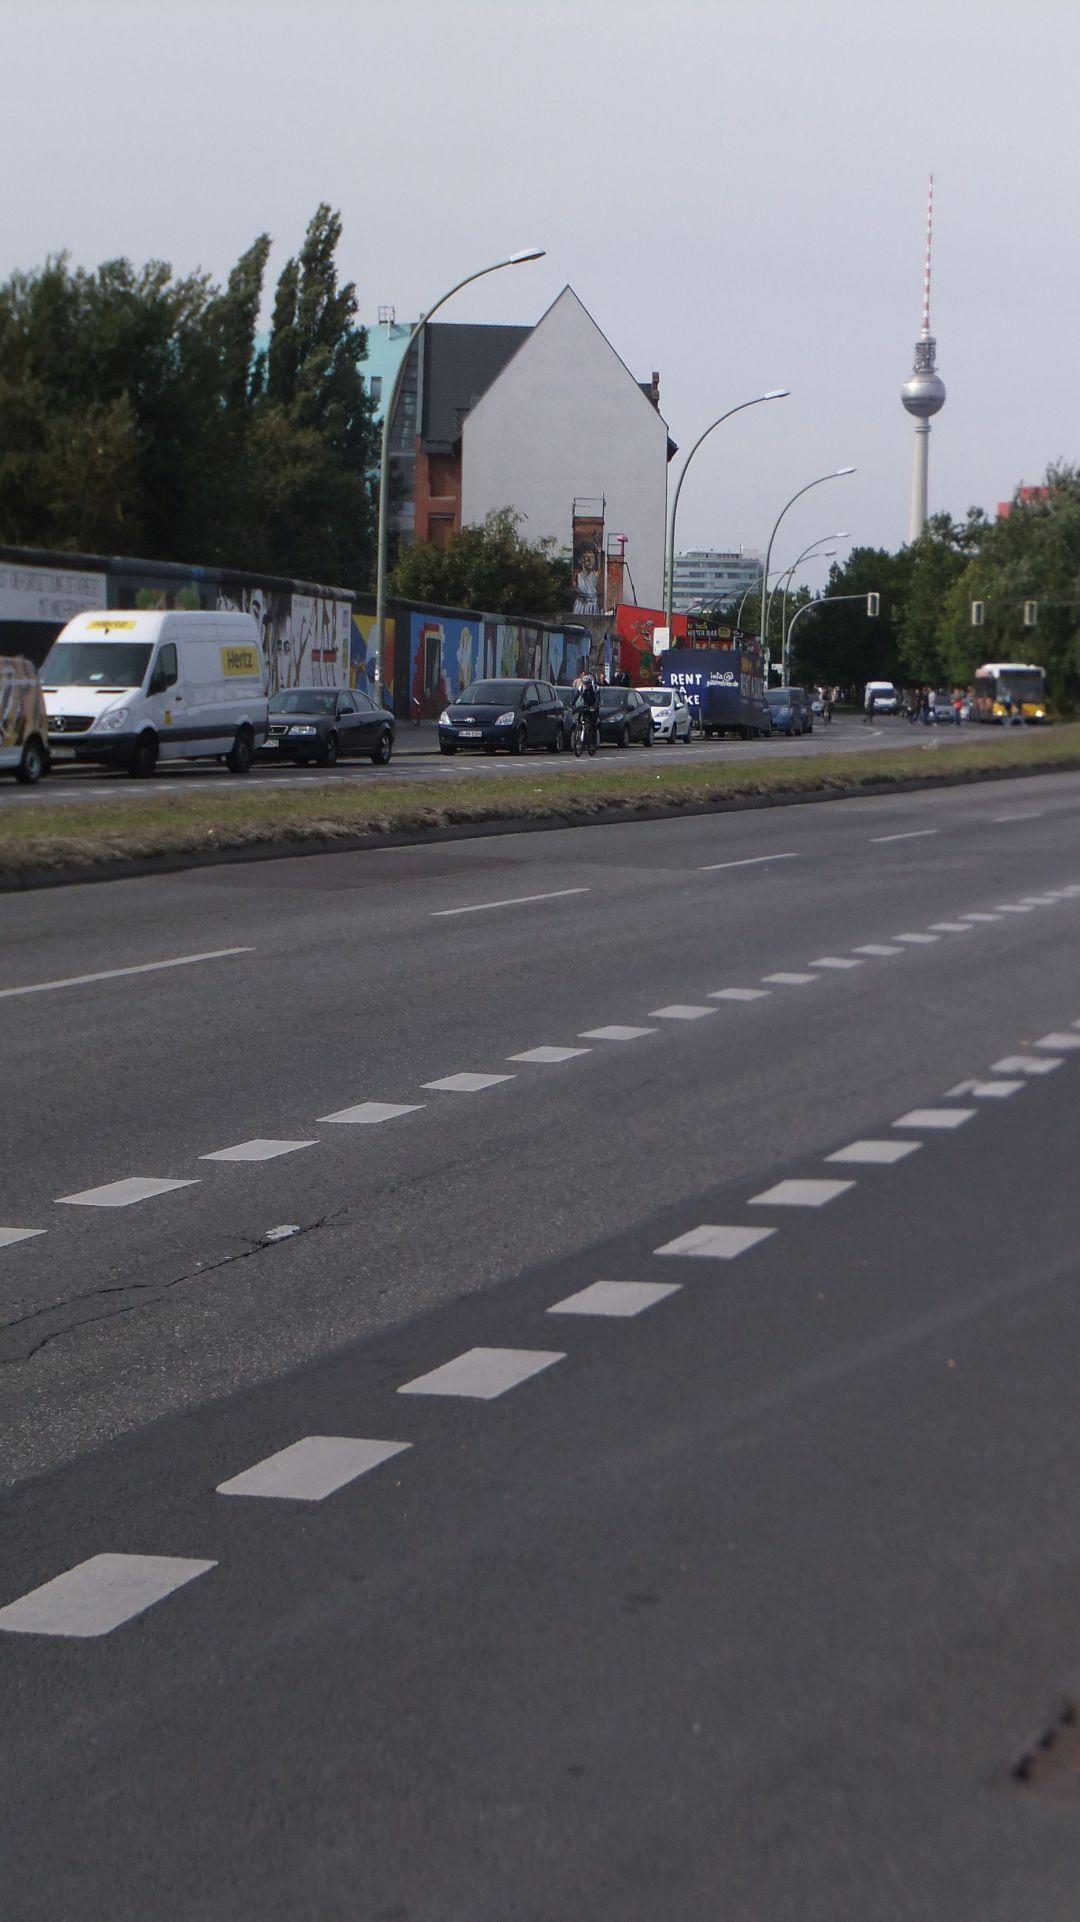 Spree Radweg 2014 - 0 (99)